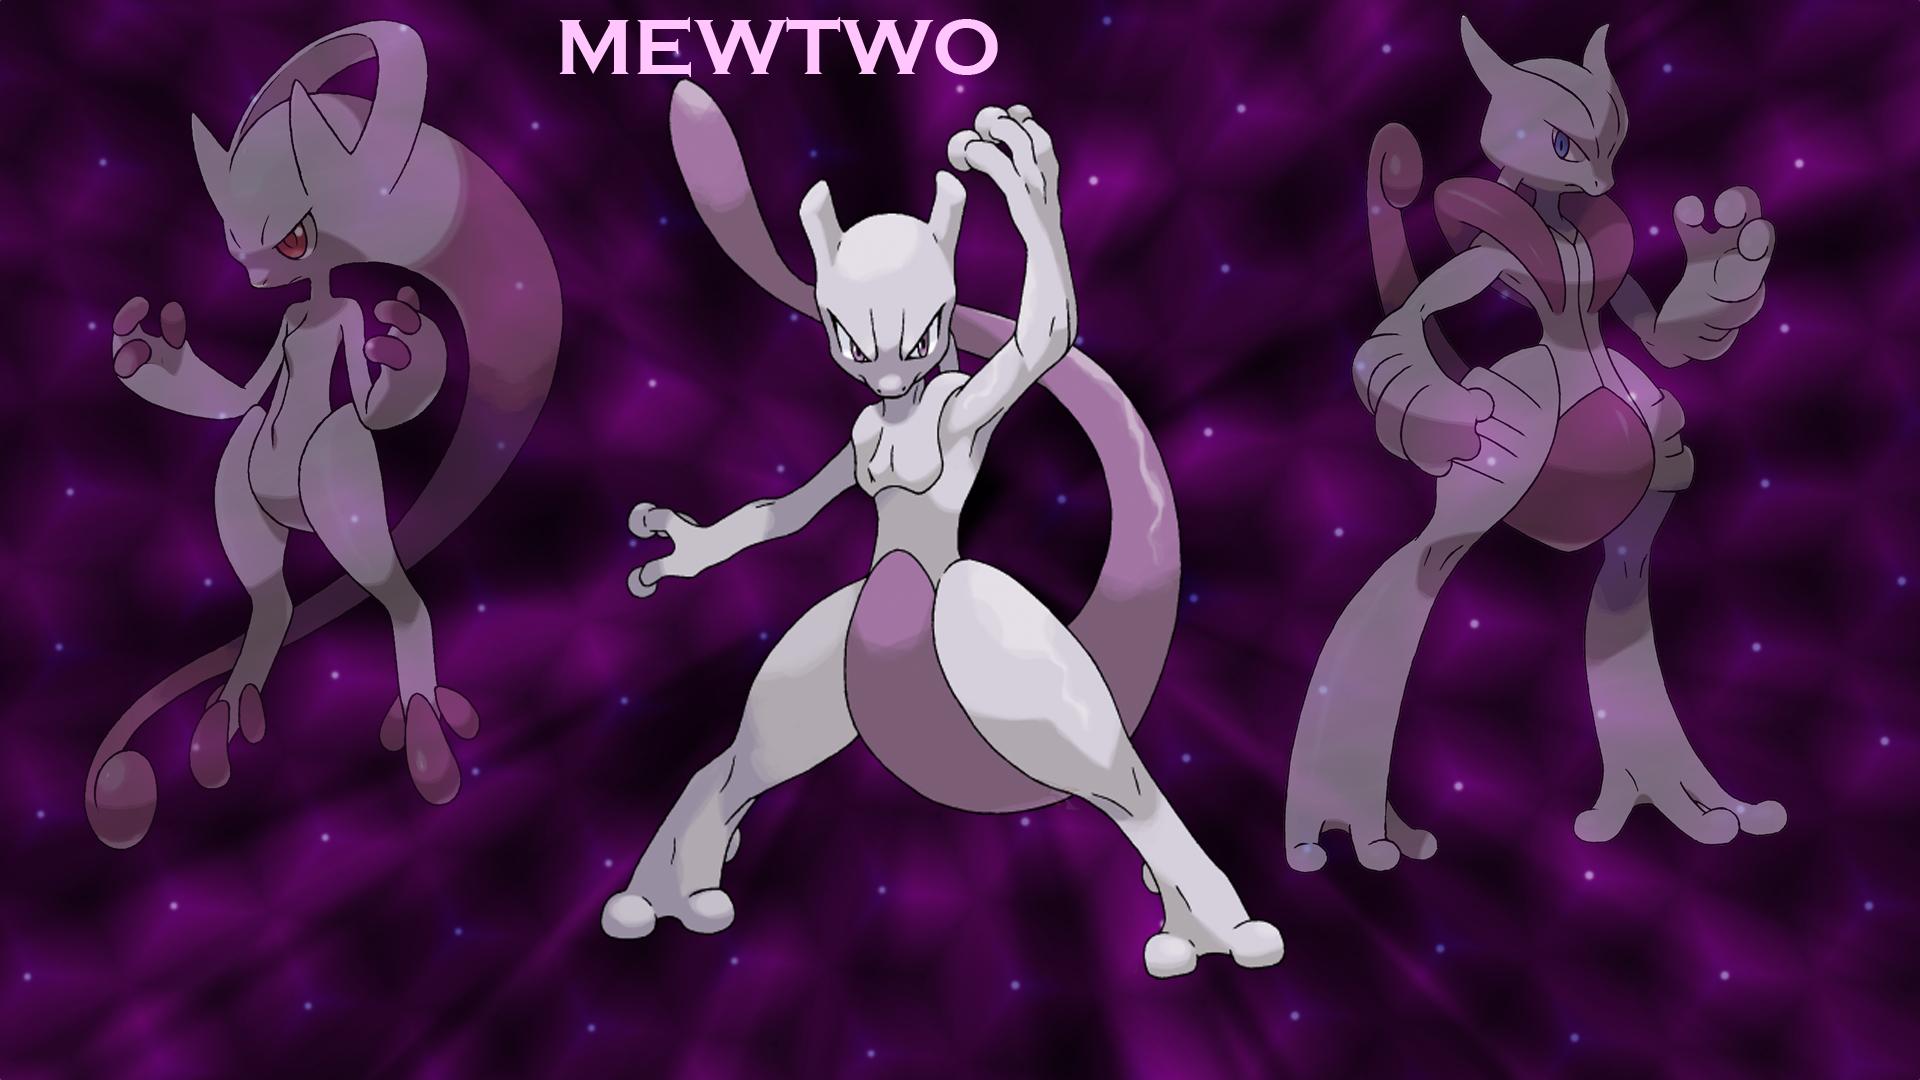 Mew vs mewtwo wallpaper